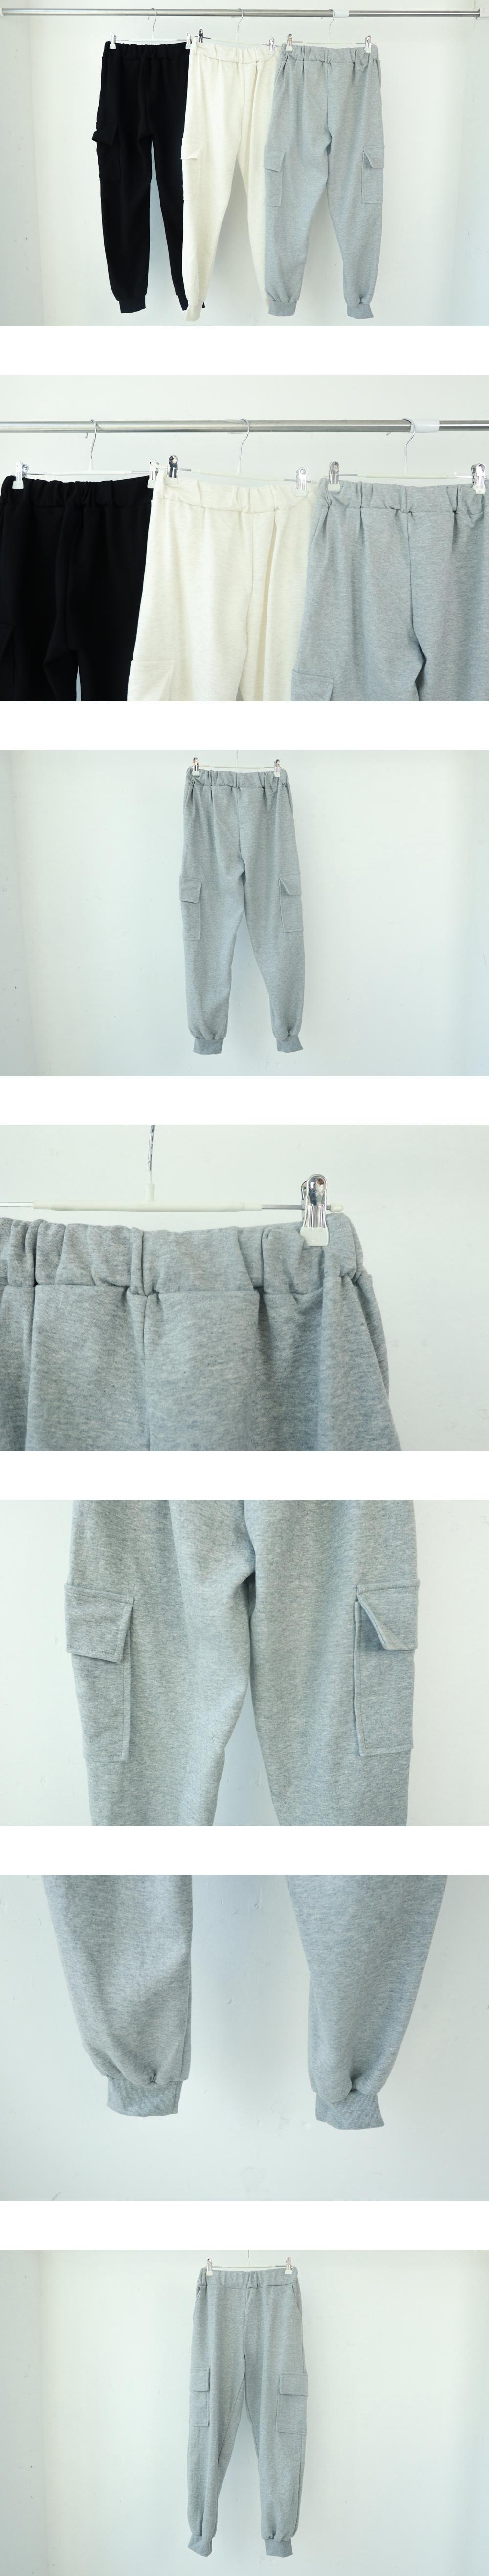 Cotton banding cargo pants